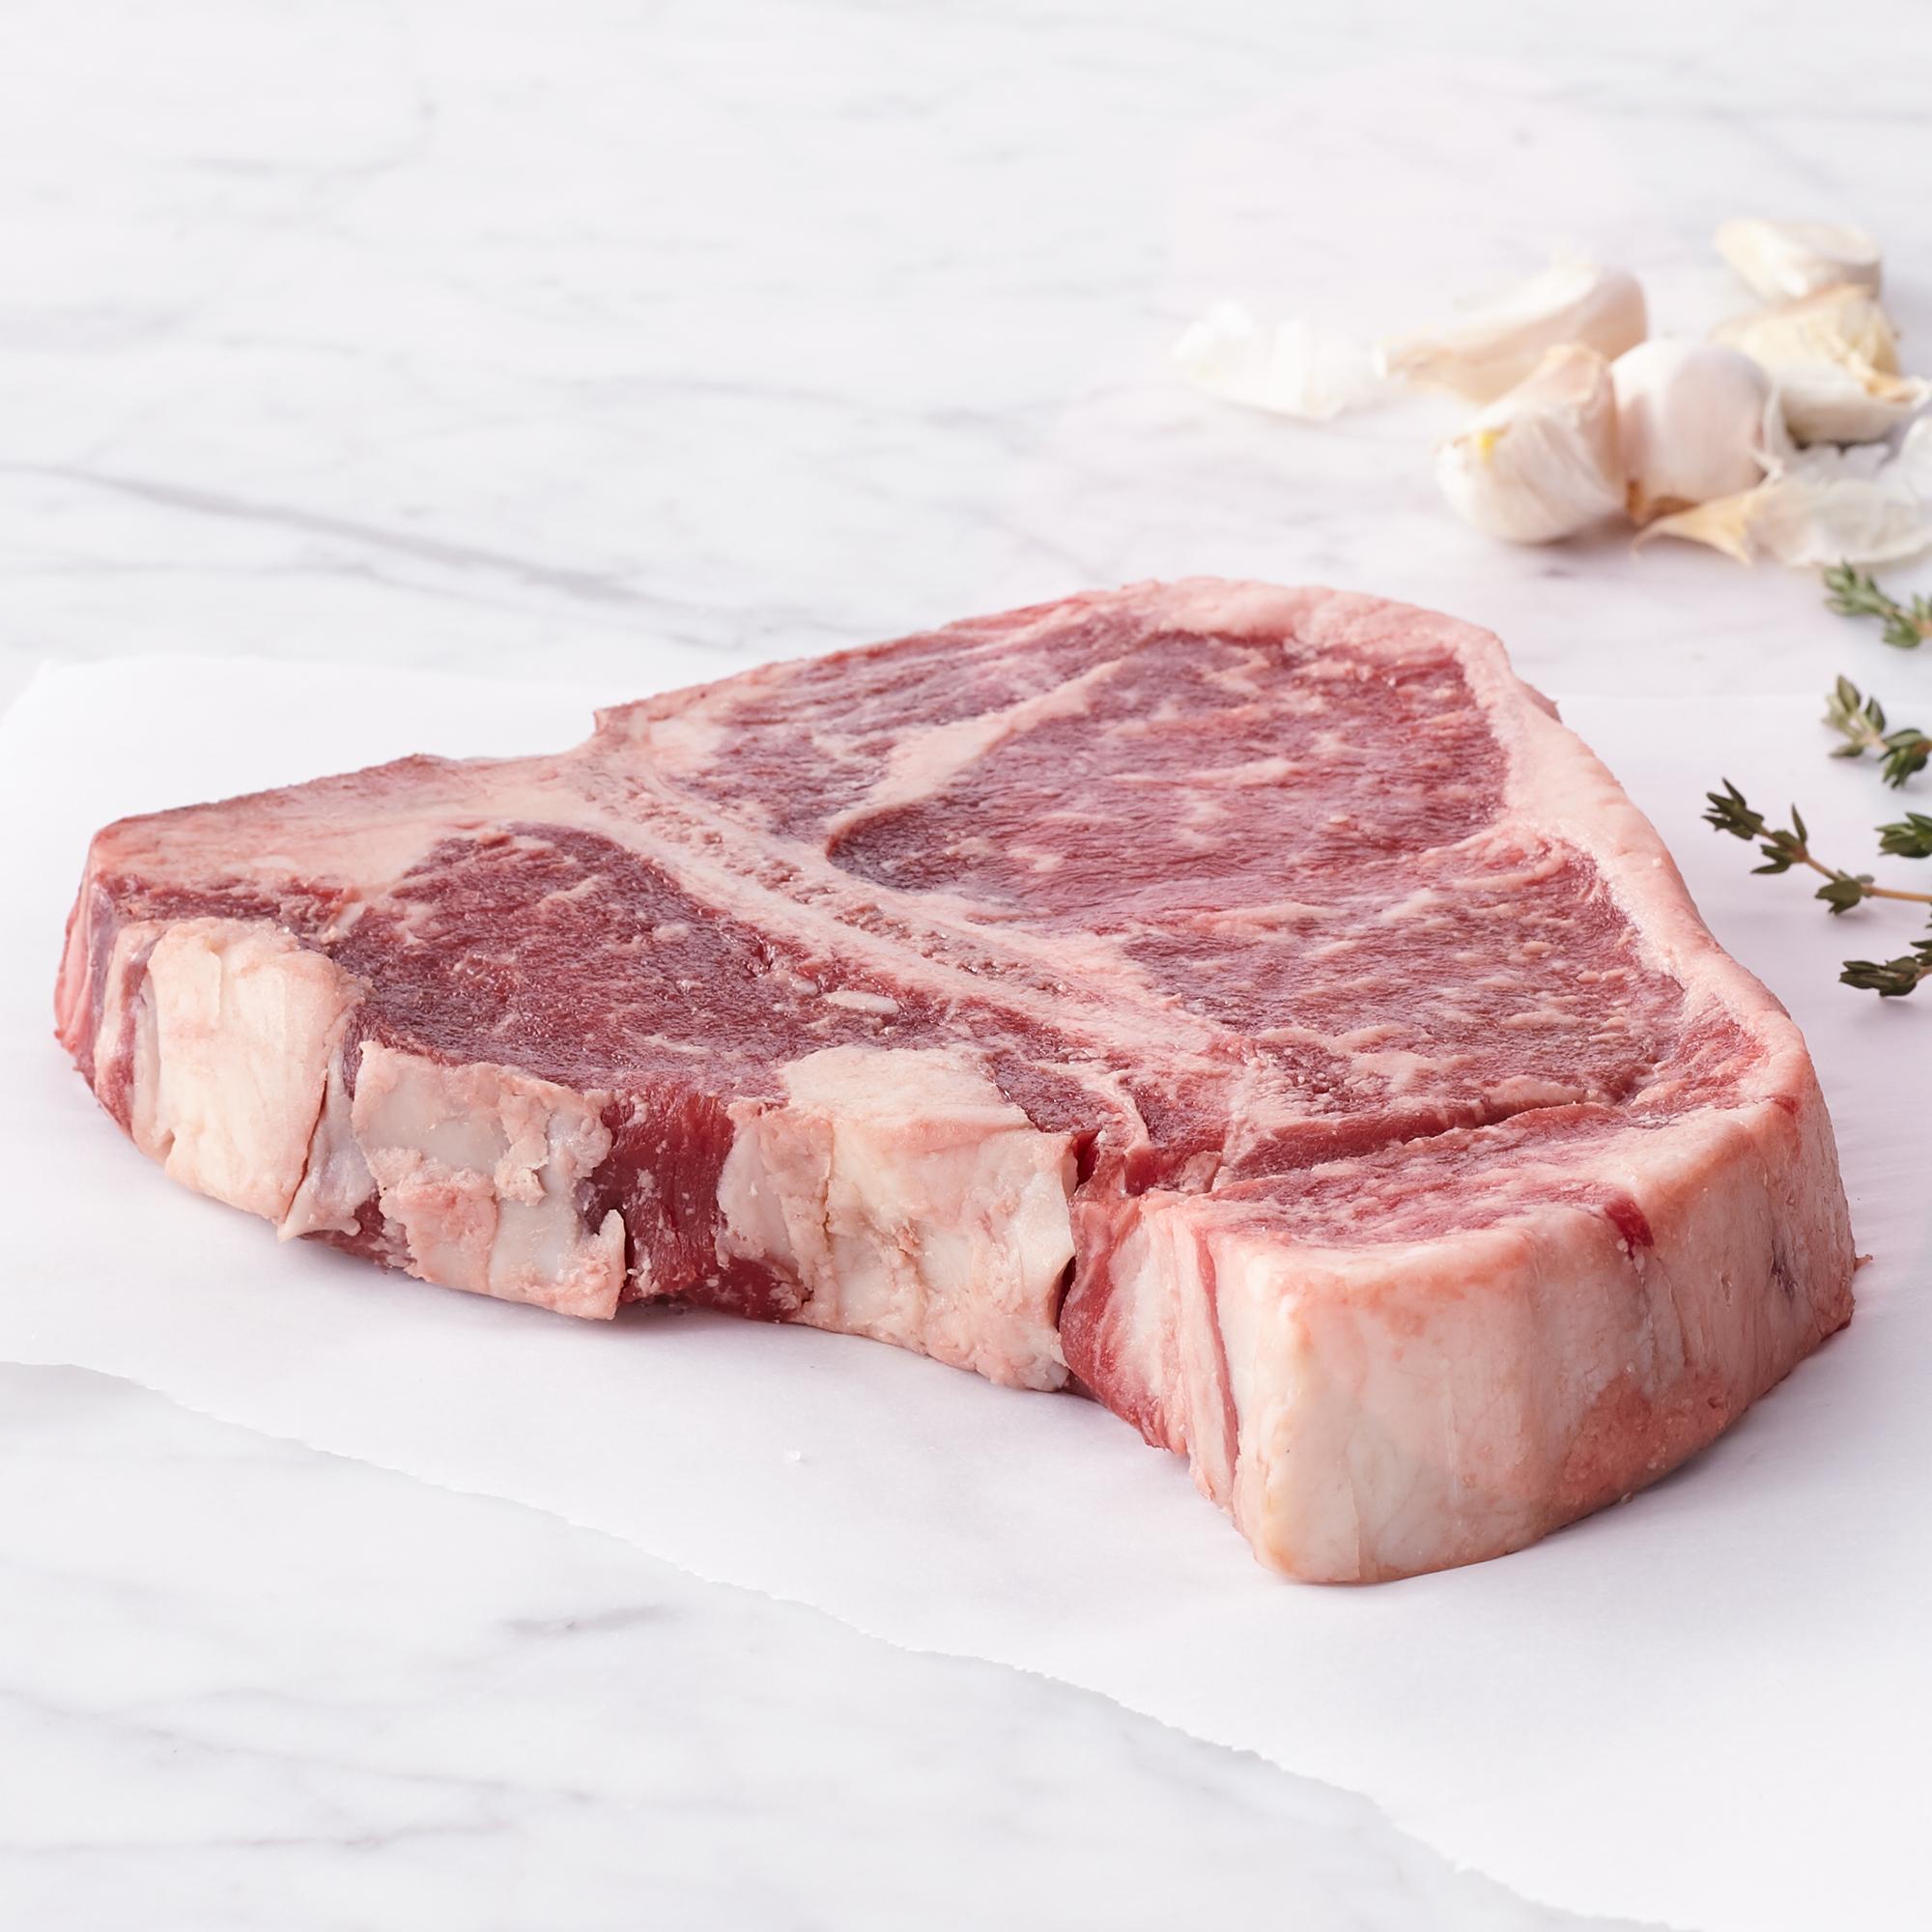 4 ct. 16 oz. Porterhouse Premium Steaks - ships frozen and raw